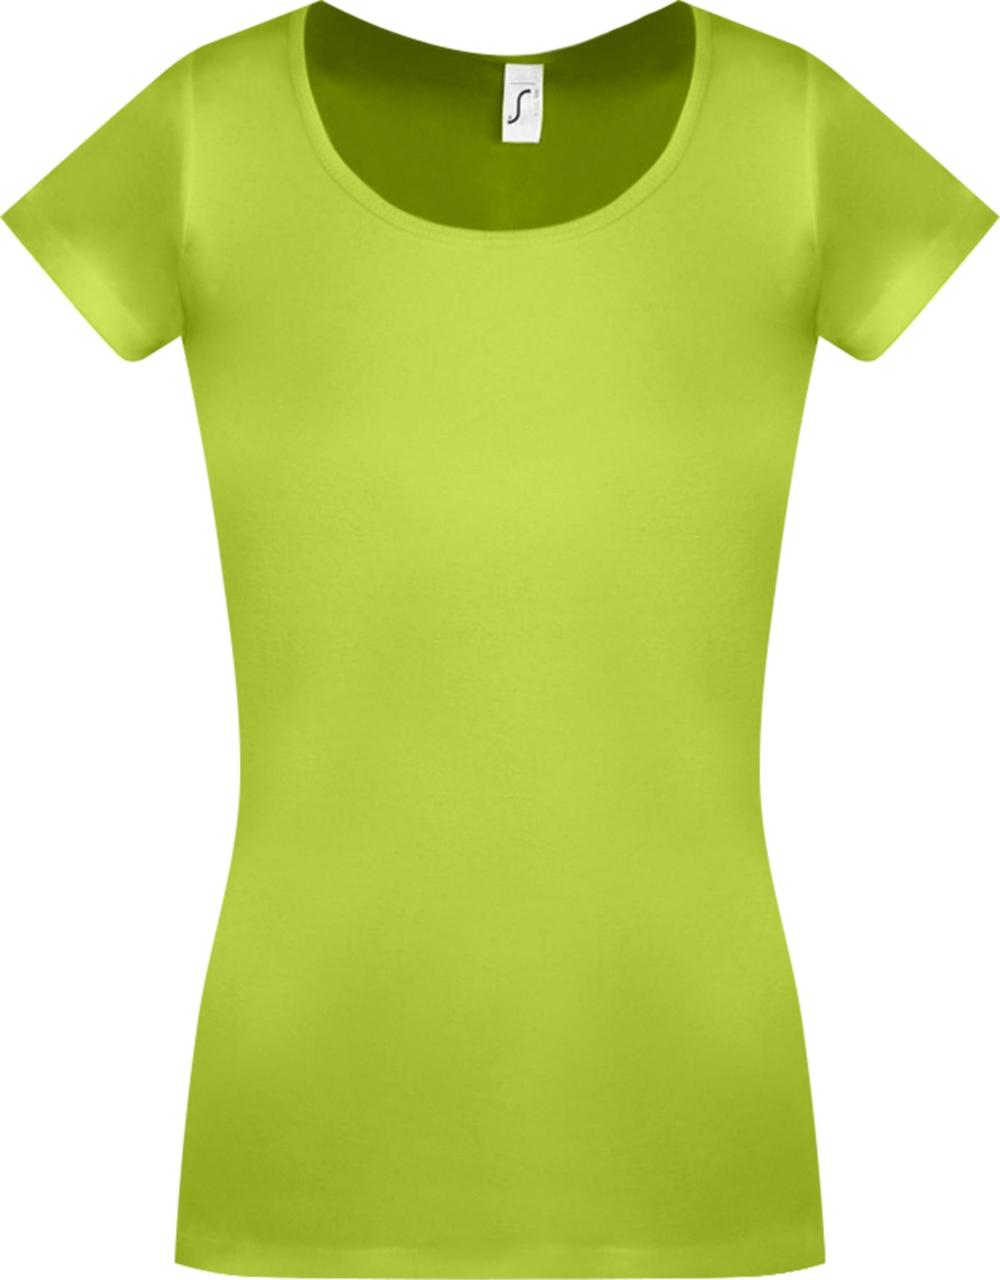 Футболка женская Moody зеленое яблоко (артикул 11865280) - фото 1